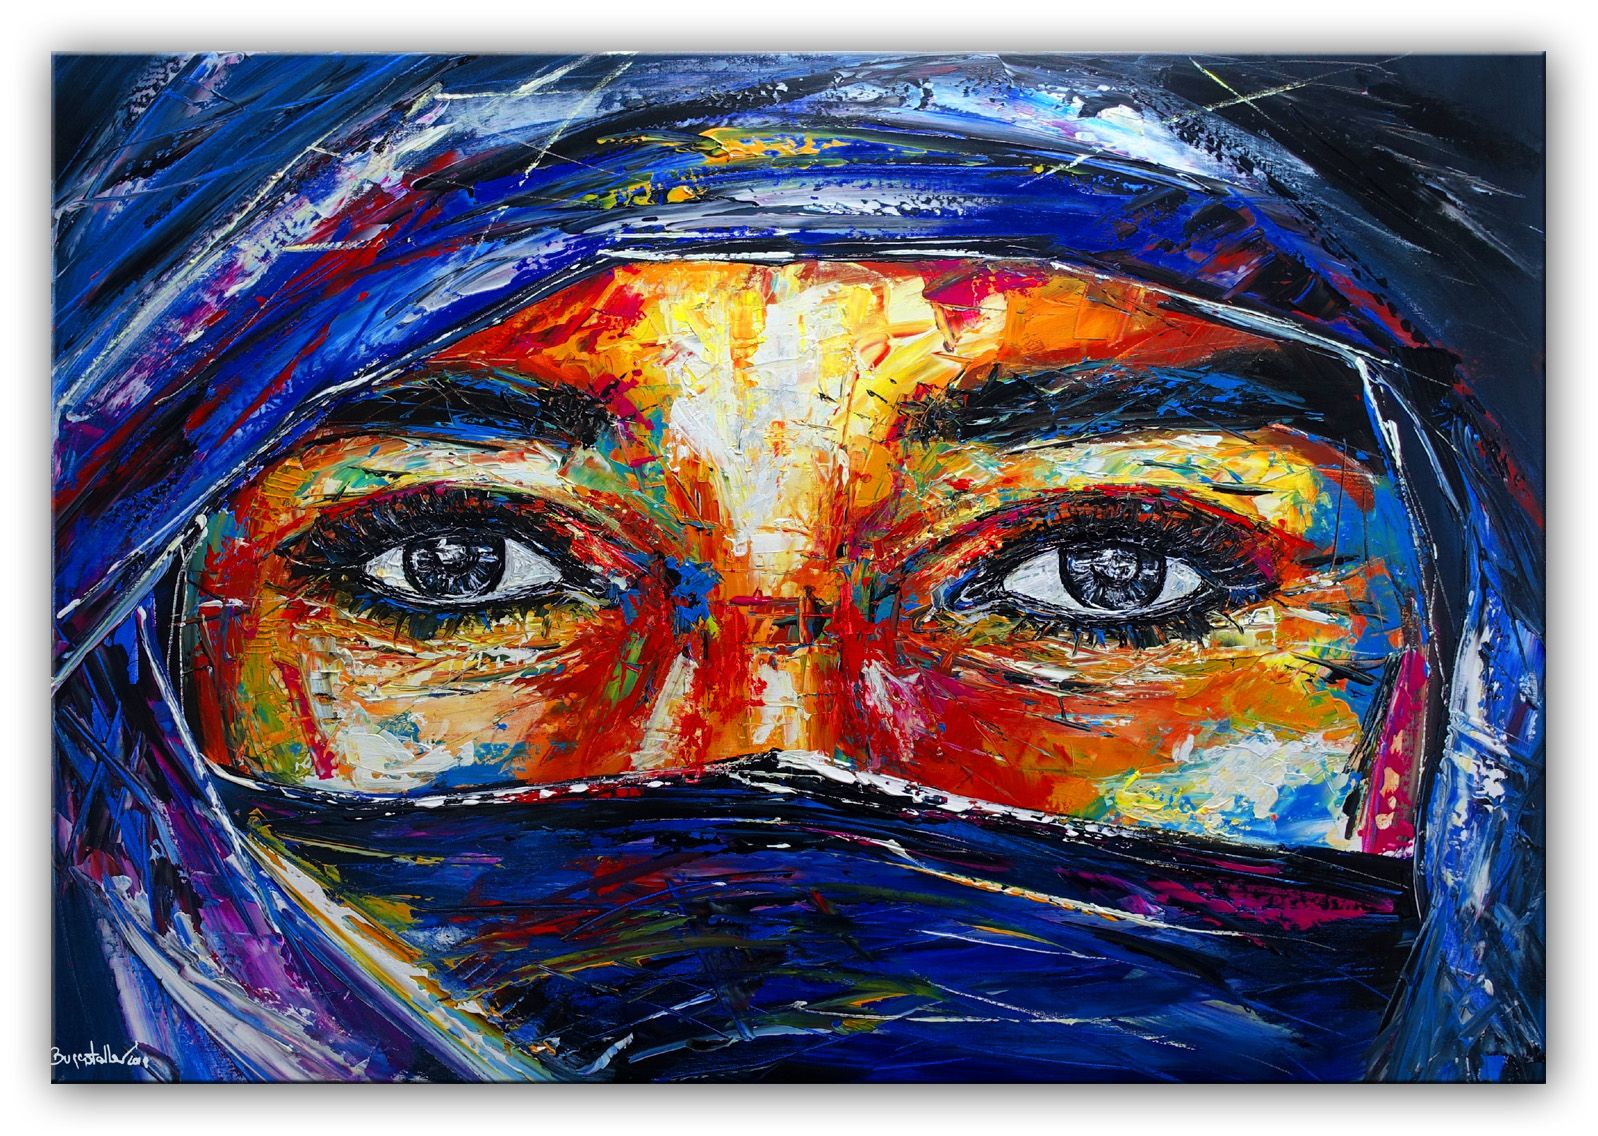 wandbild frauen gesicht abstrakt fluid art pouring malen malerei original gemalde abstrakte kunst kaufen bilder acryl